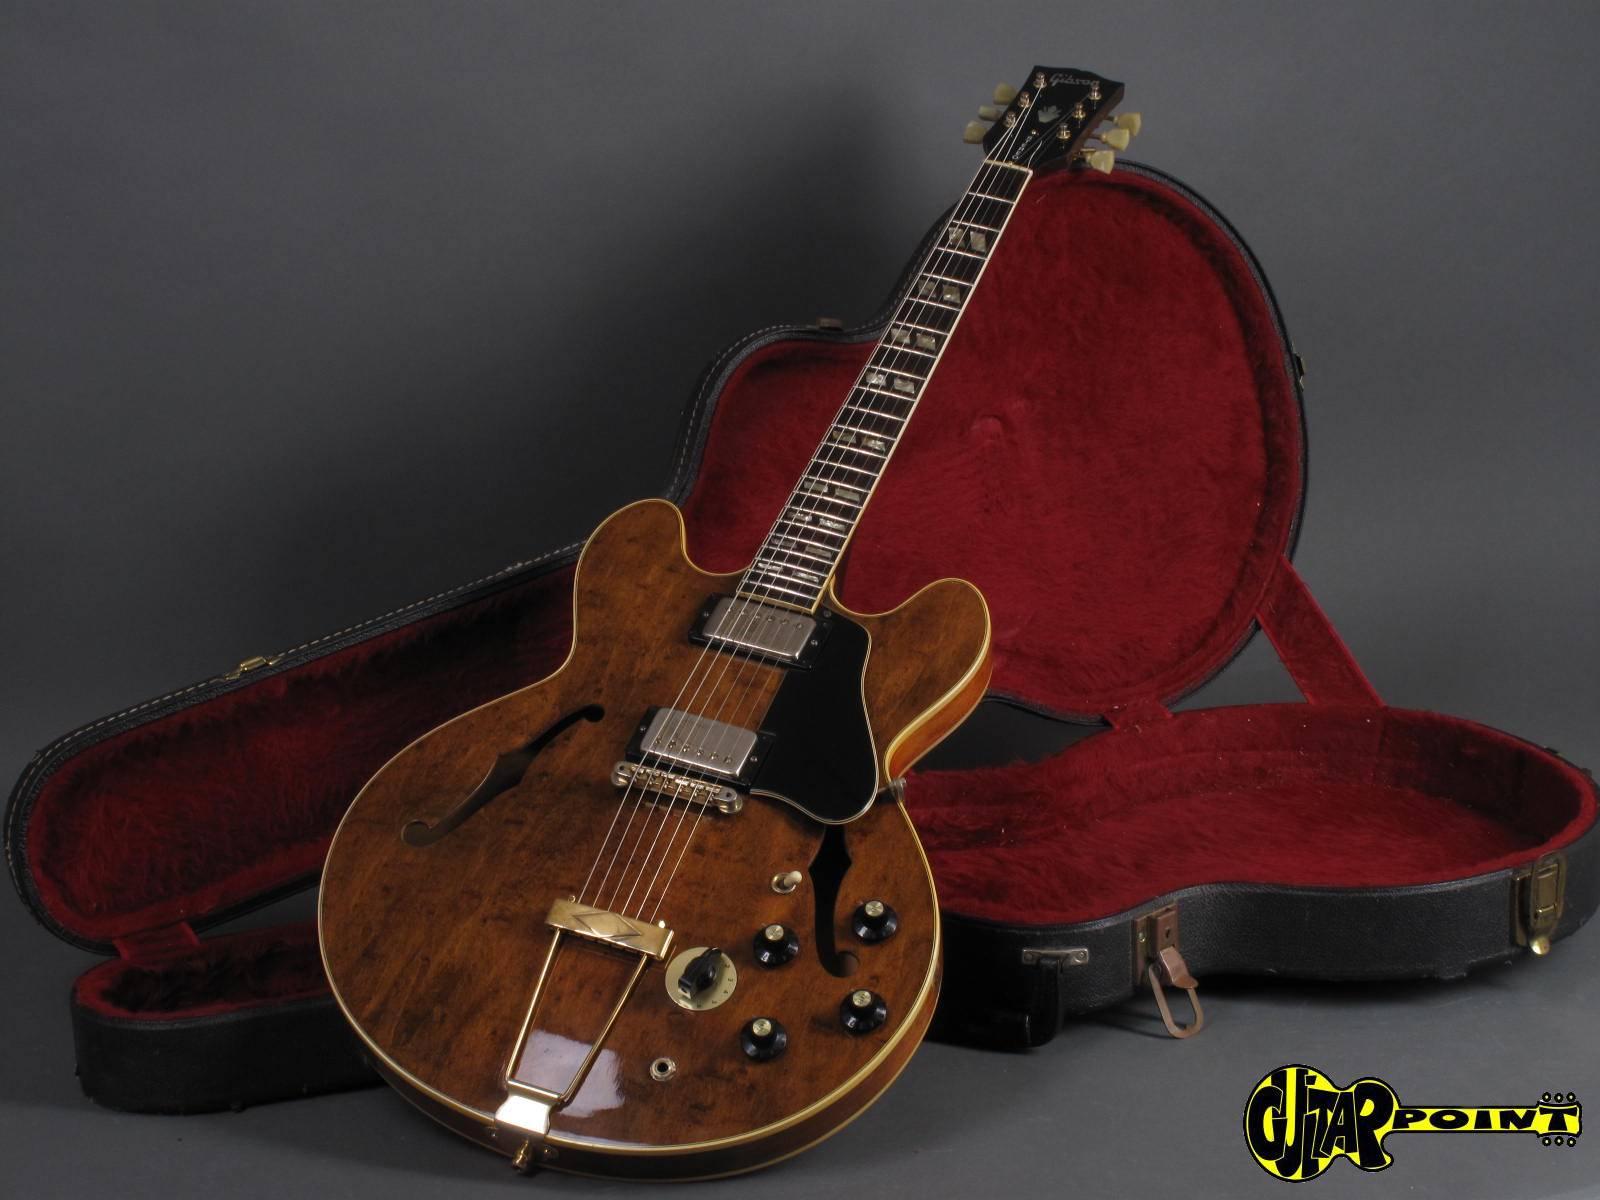 gibson es 345 td stereo 1974 walnut guitar for sale guitarpoint. Black Bedroom Furniture Sets. Home Design Ideas